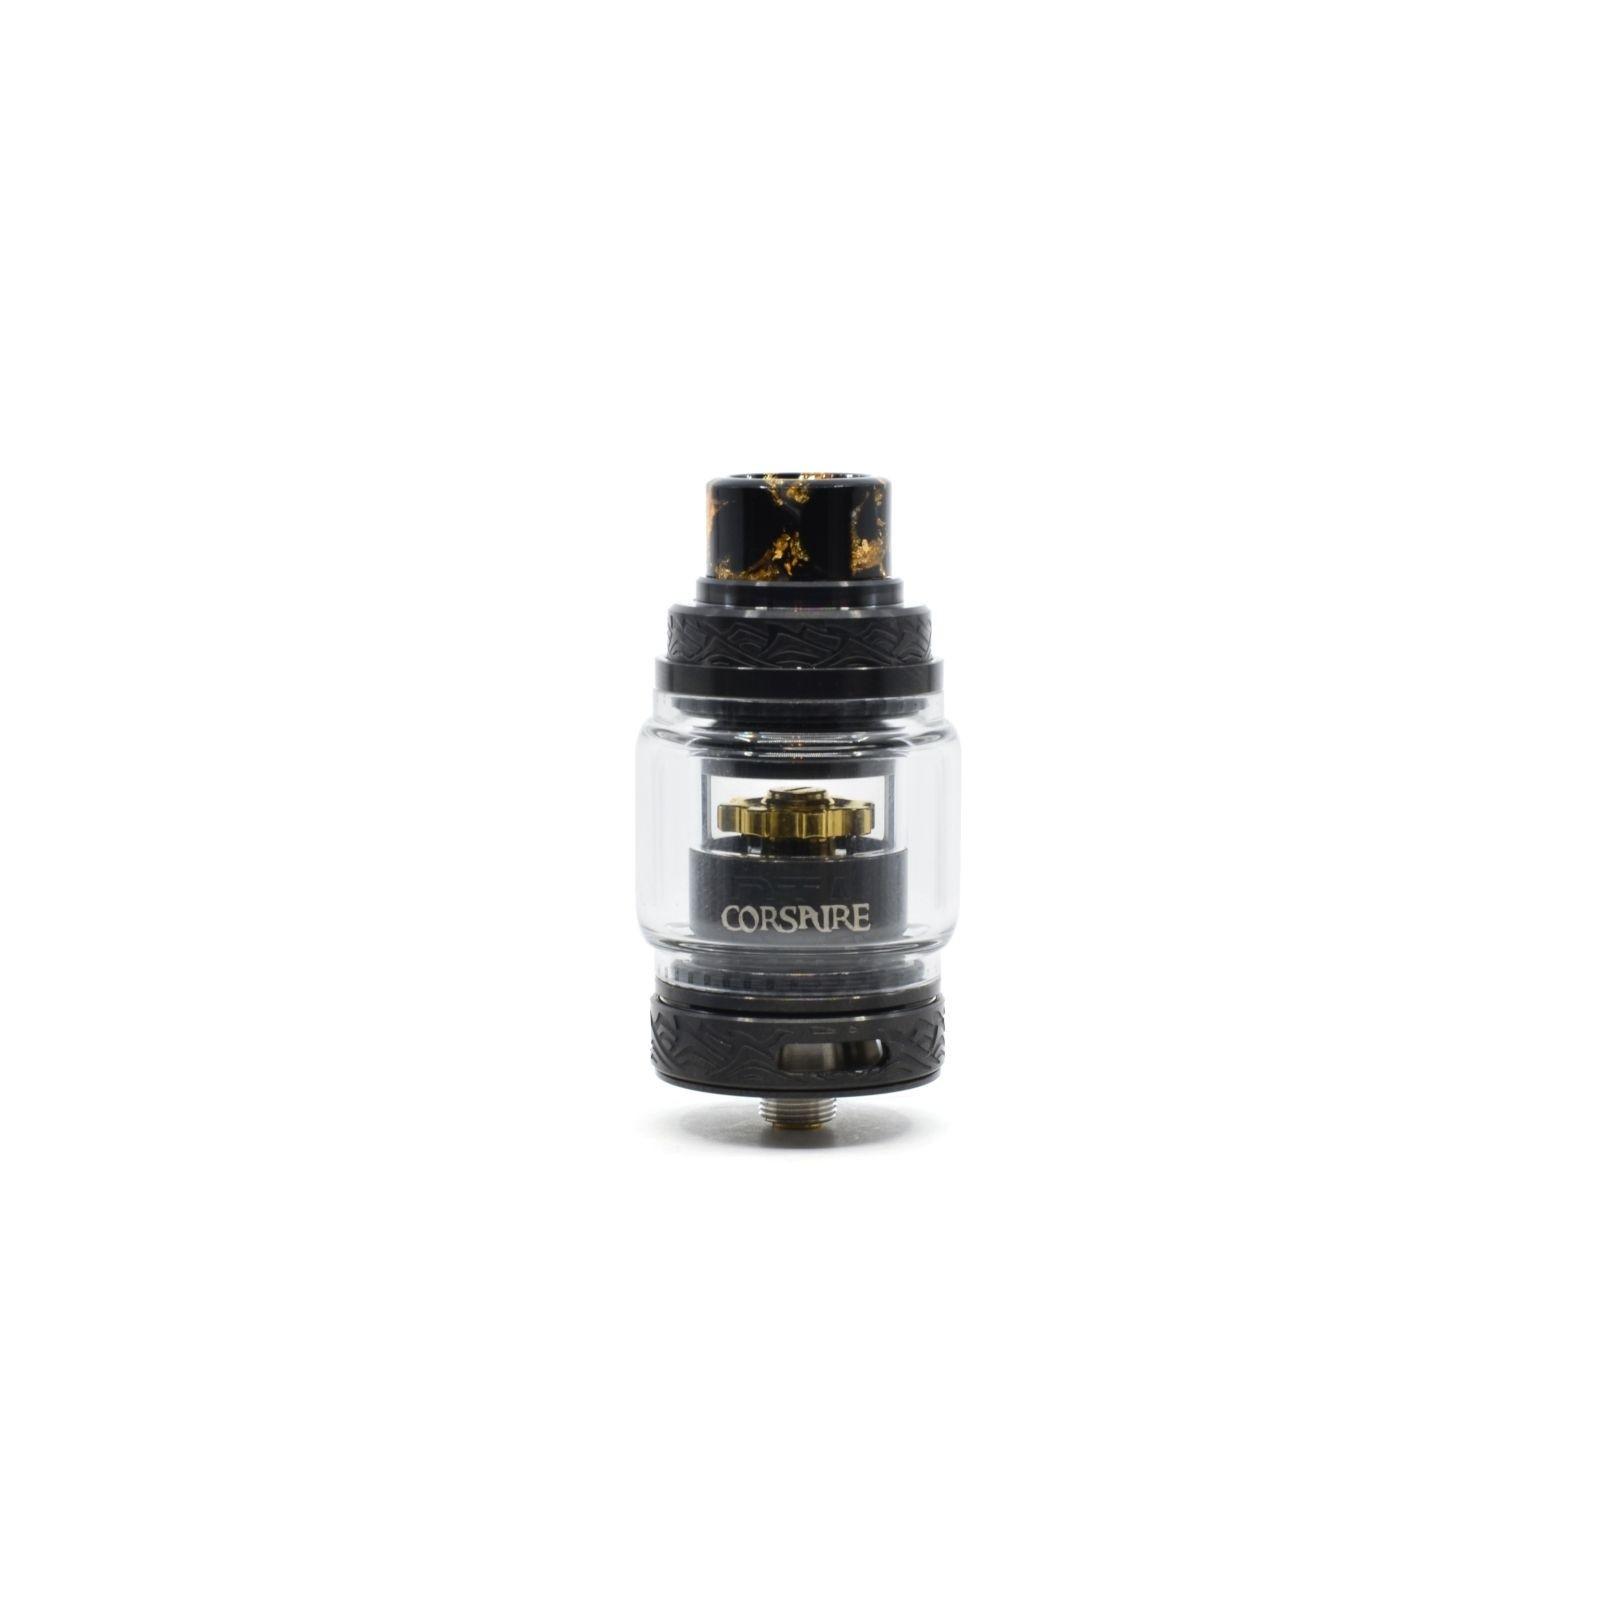 Corsaire RTA - Fumytech